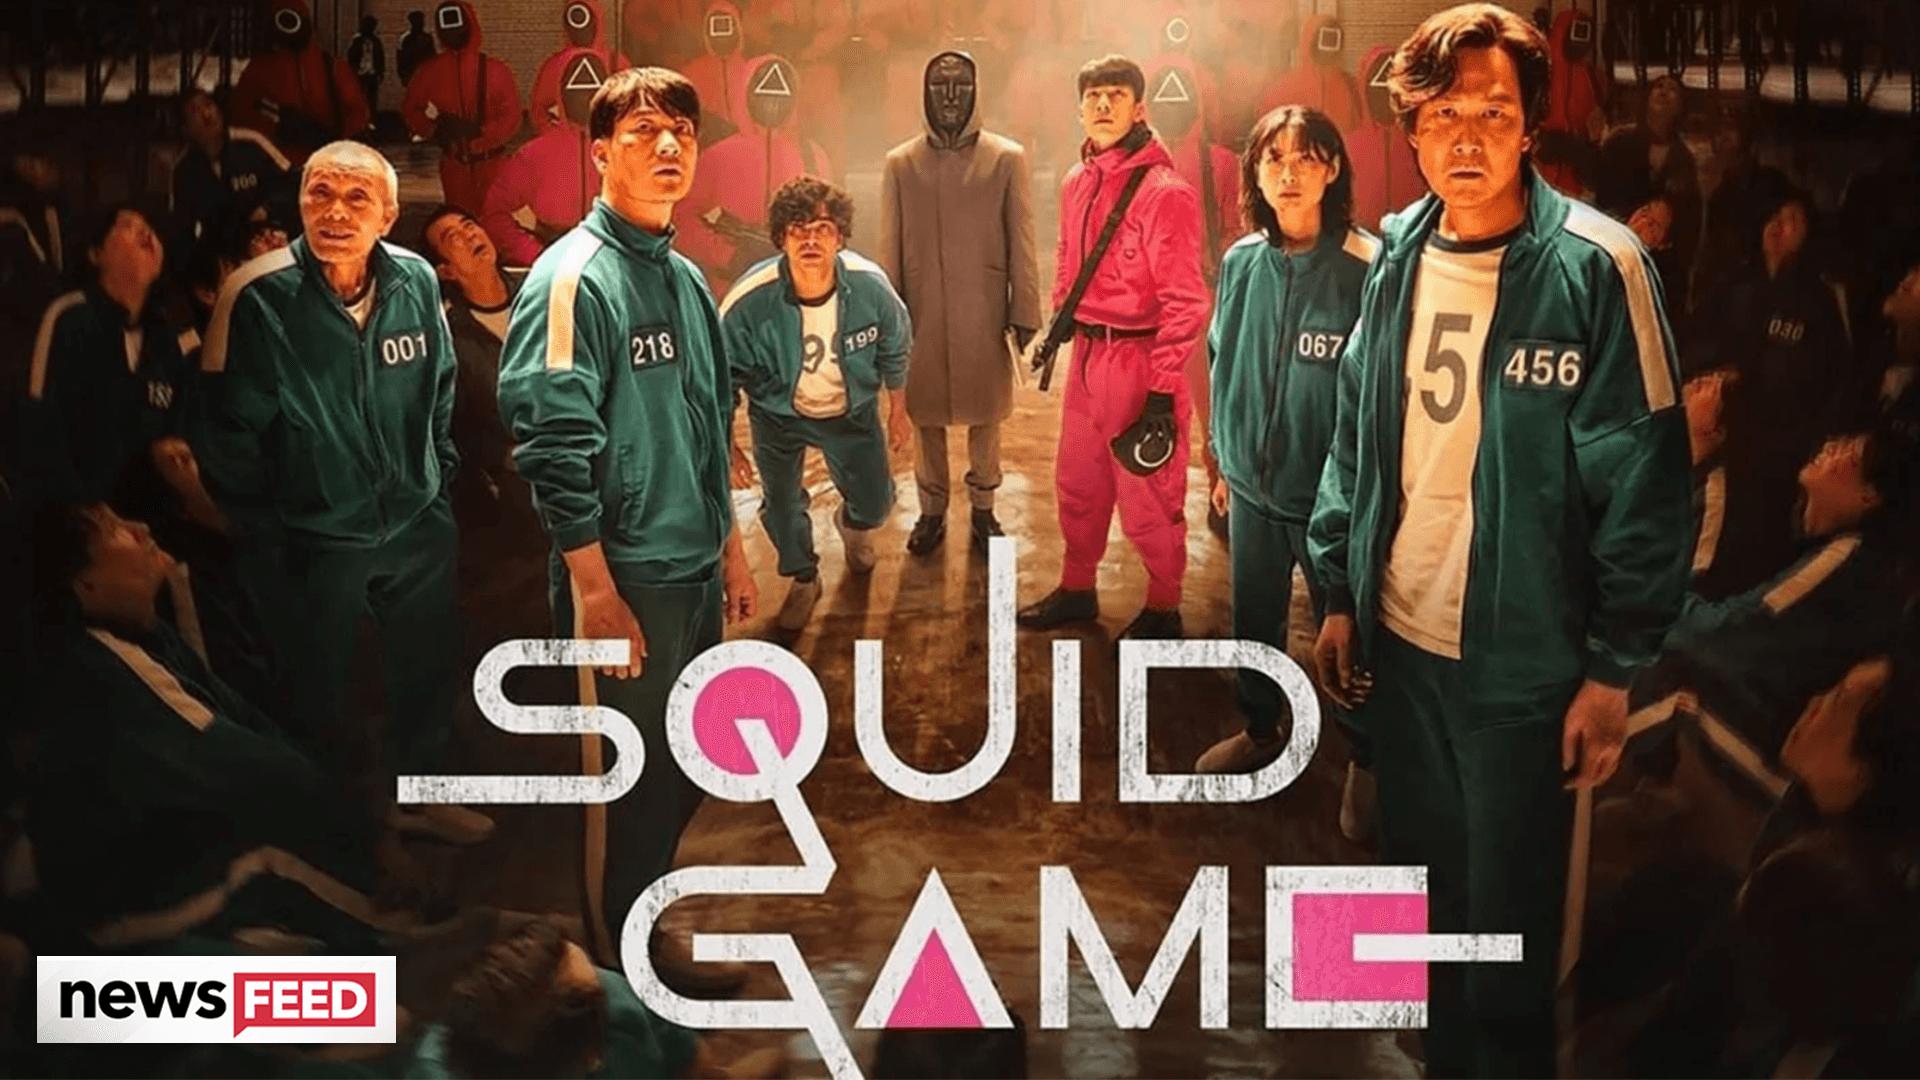 Squid Game - The Global Box Office Hit Netflix Needed - Bye Keynote Speaker Igor Beuker